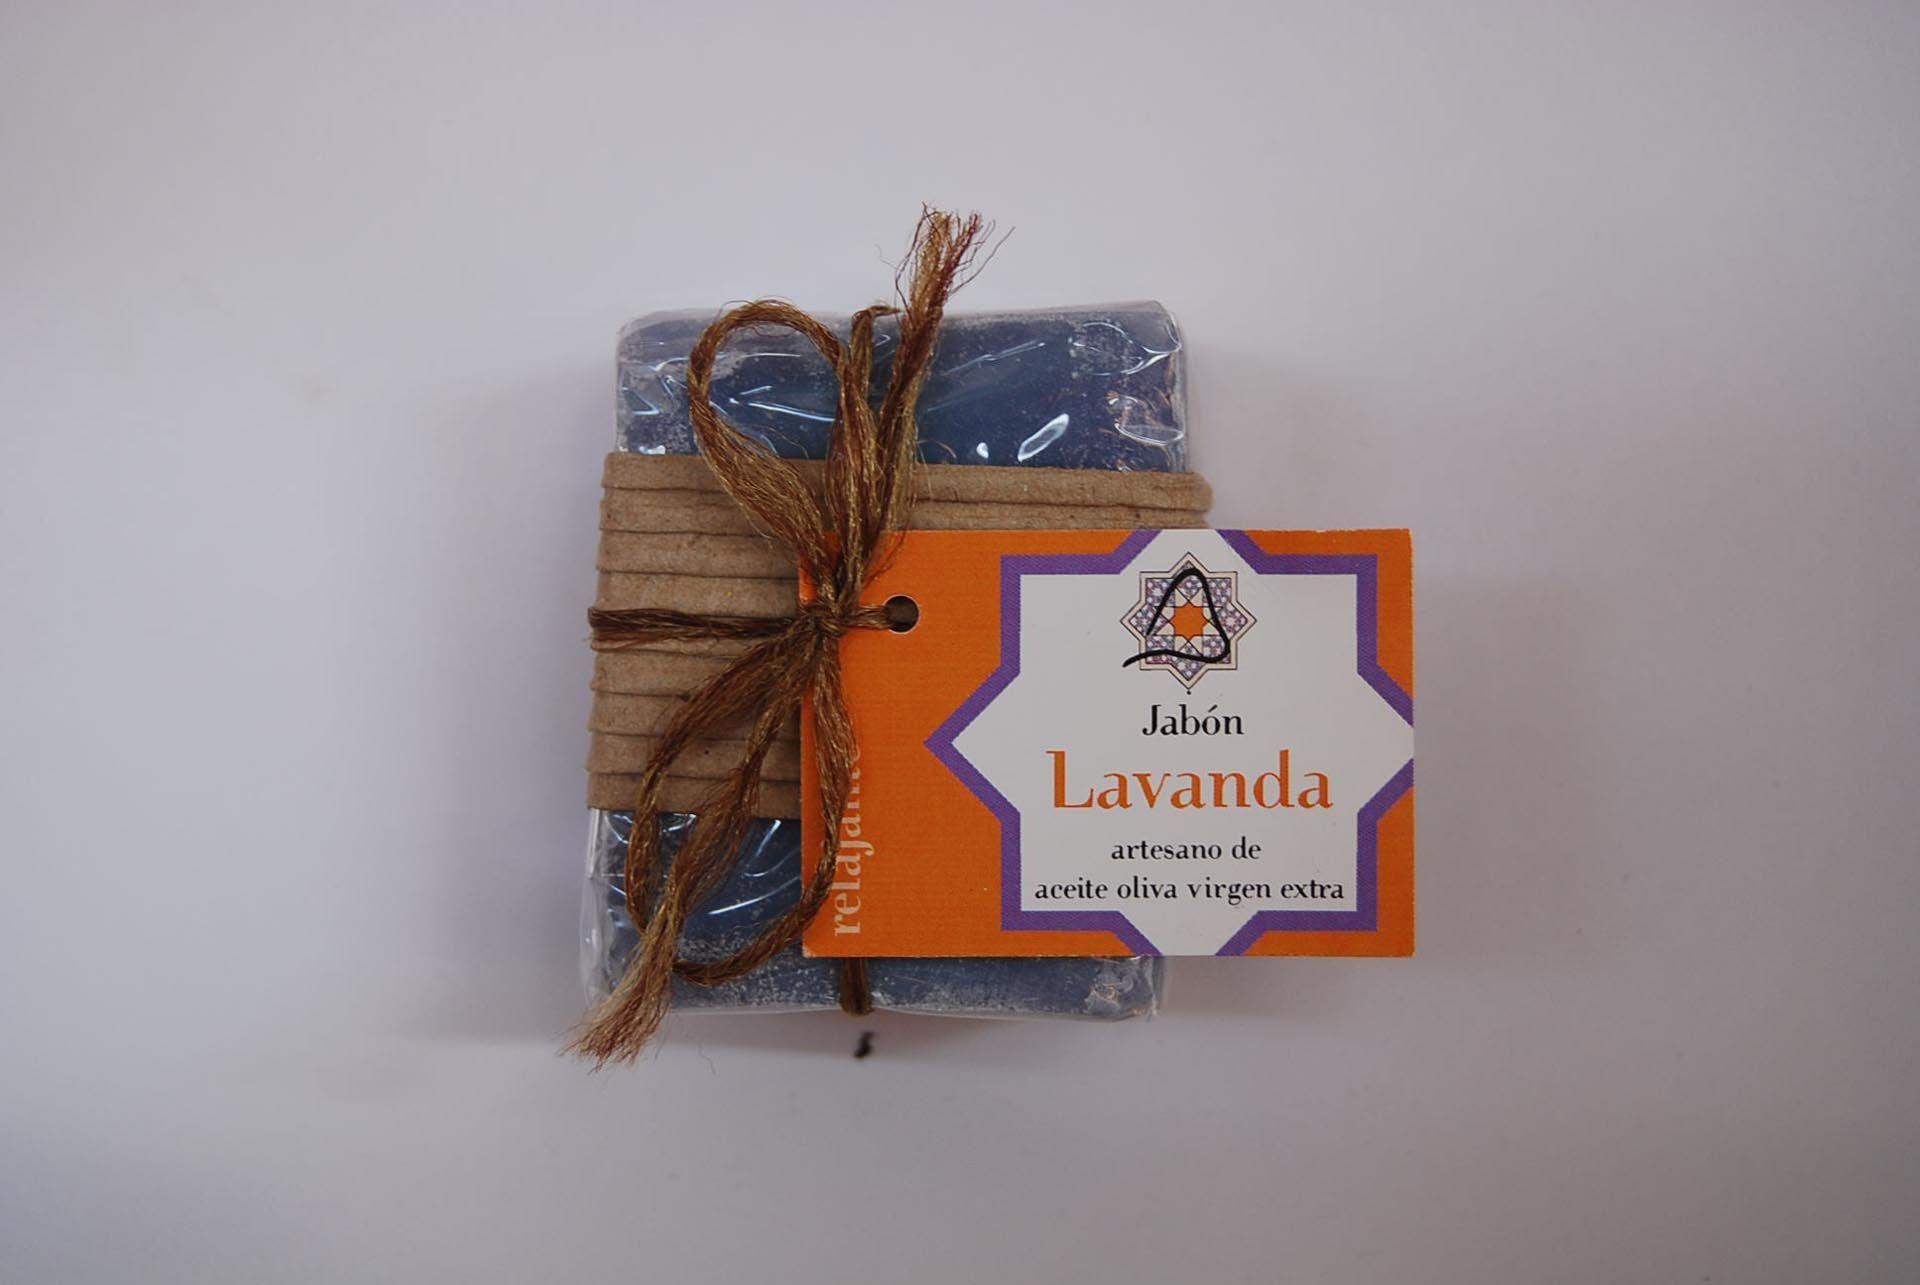 Jabón artesano de lavanda: Productos de Arahí